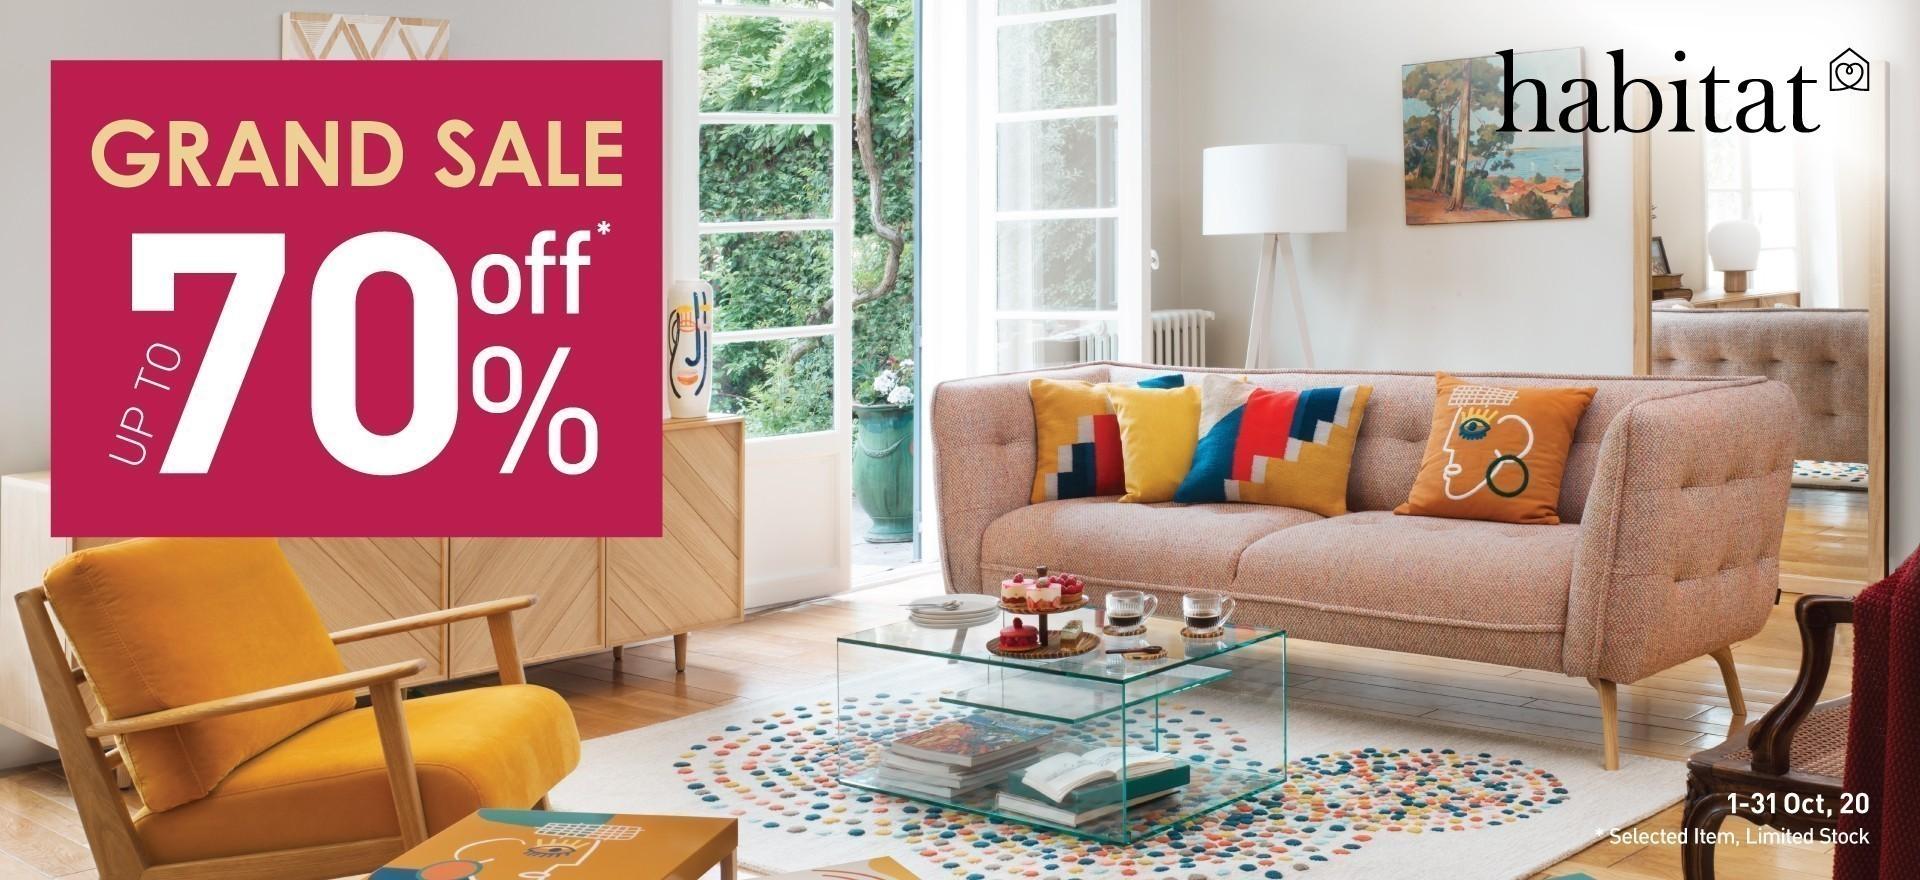 Habitat Grand Sale up to 70%off